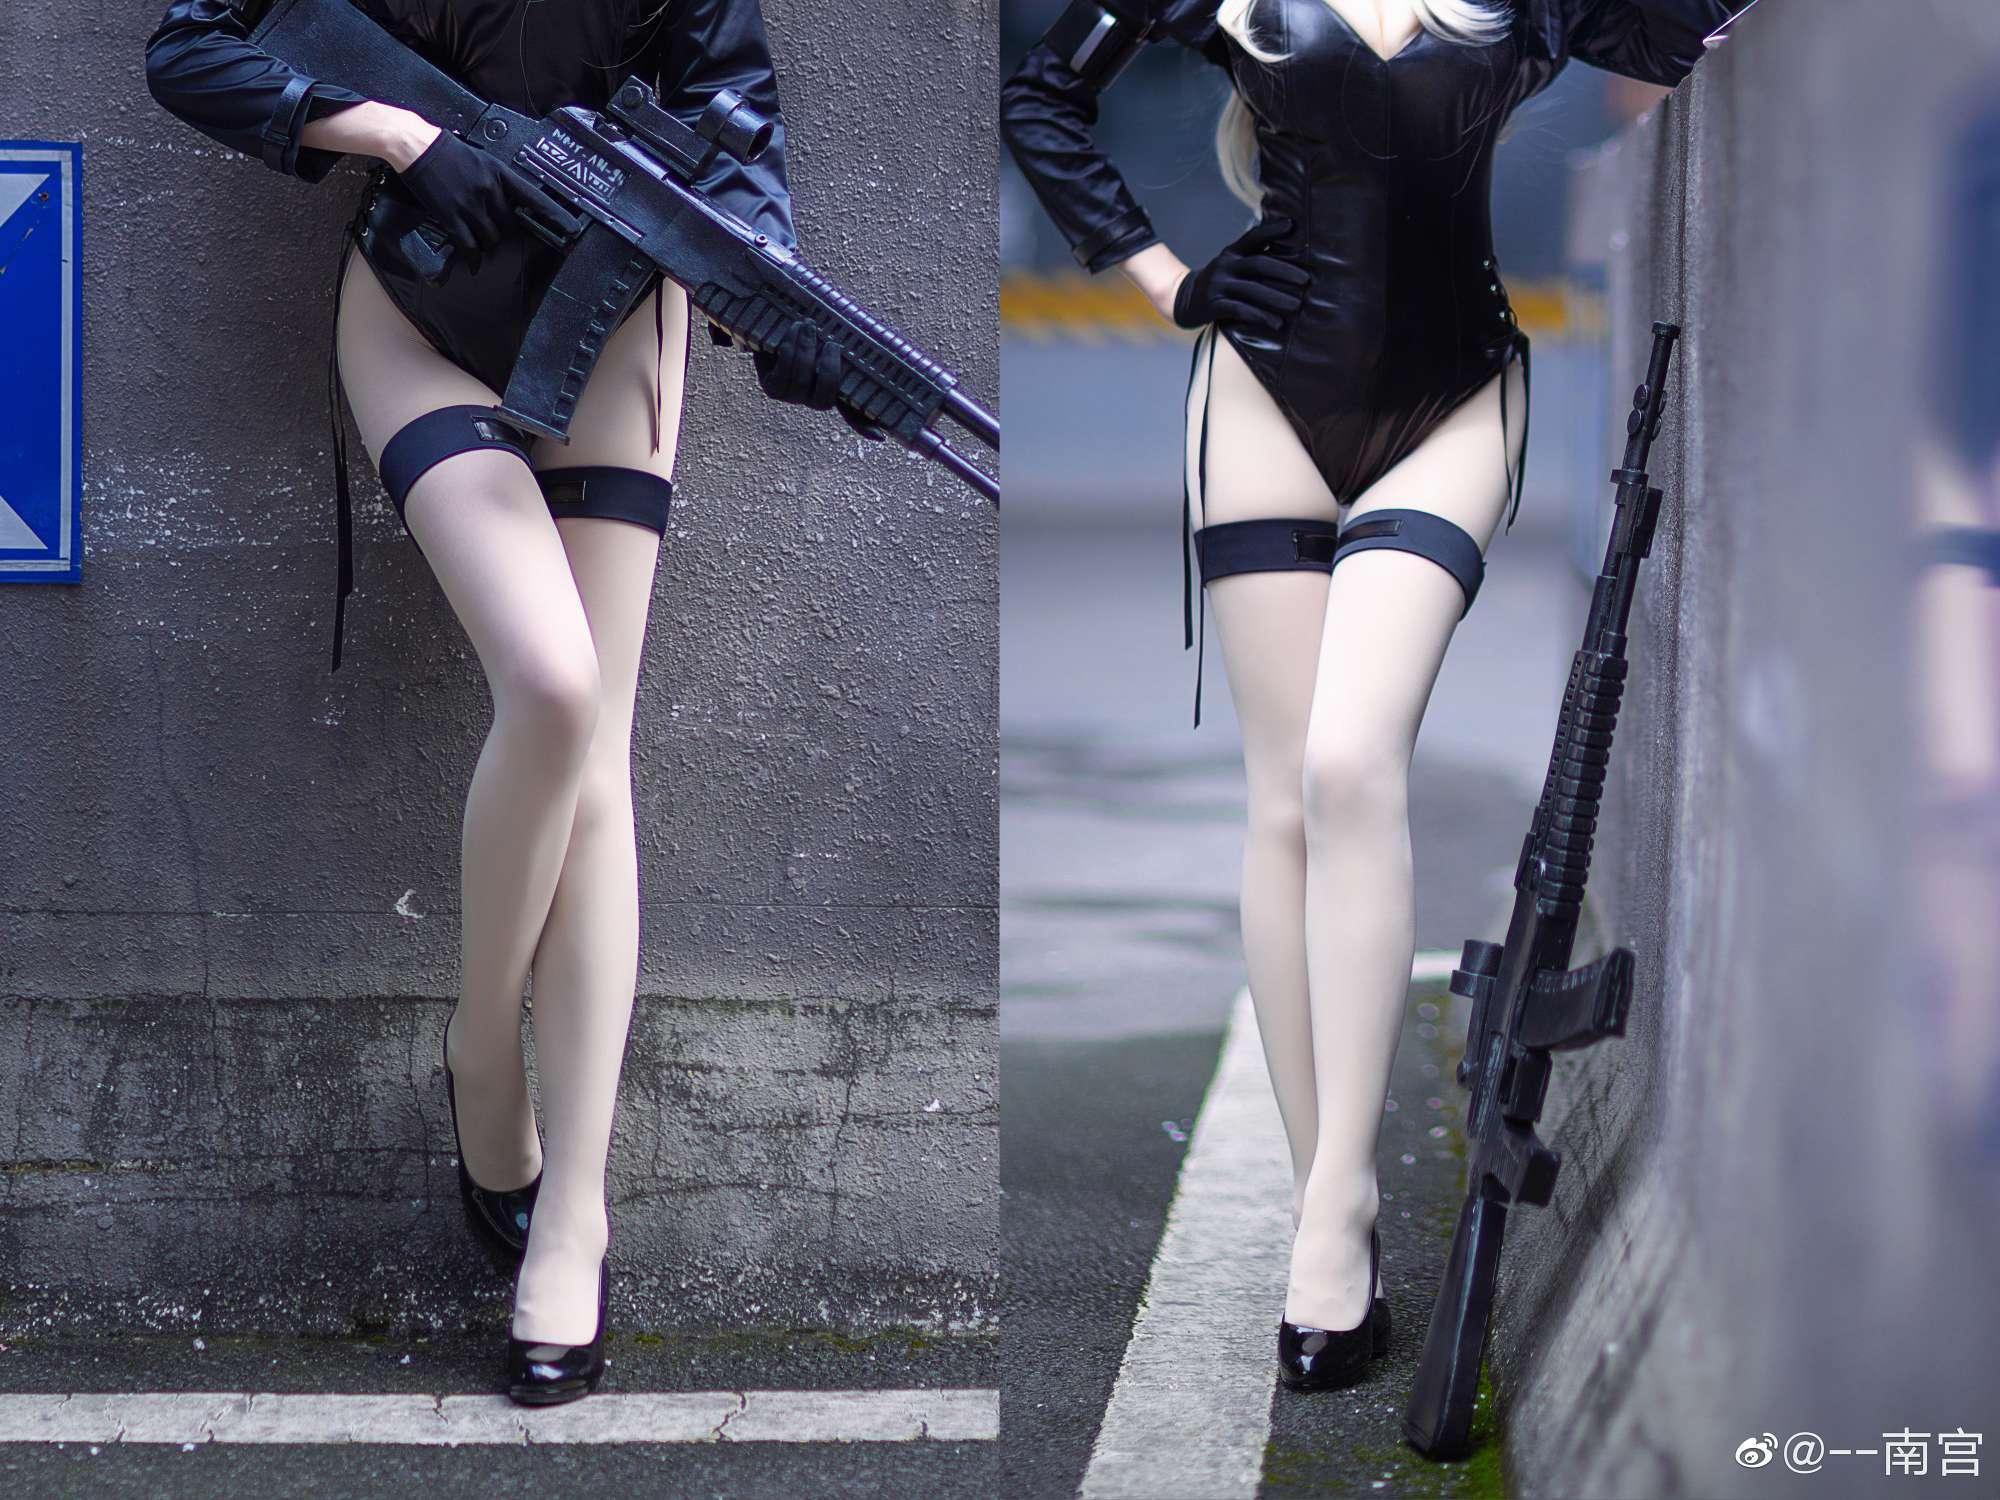 【cos】兔女郎[指挥官,今晚你陪我吧]